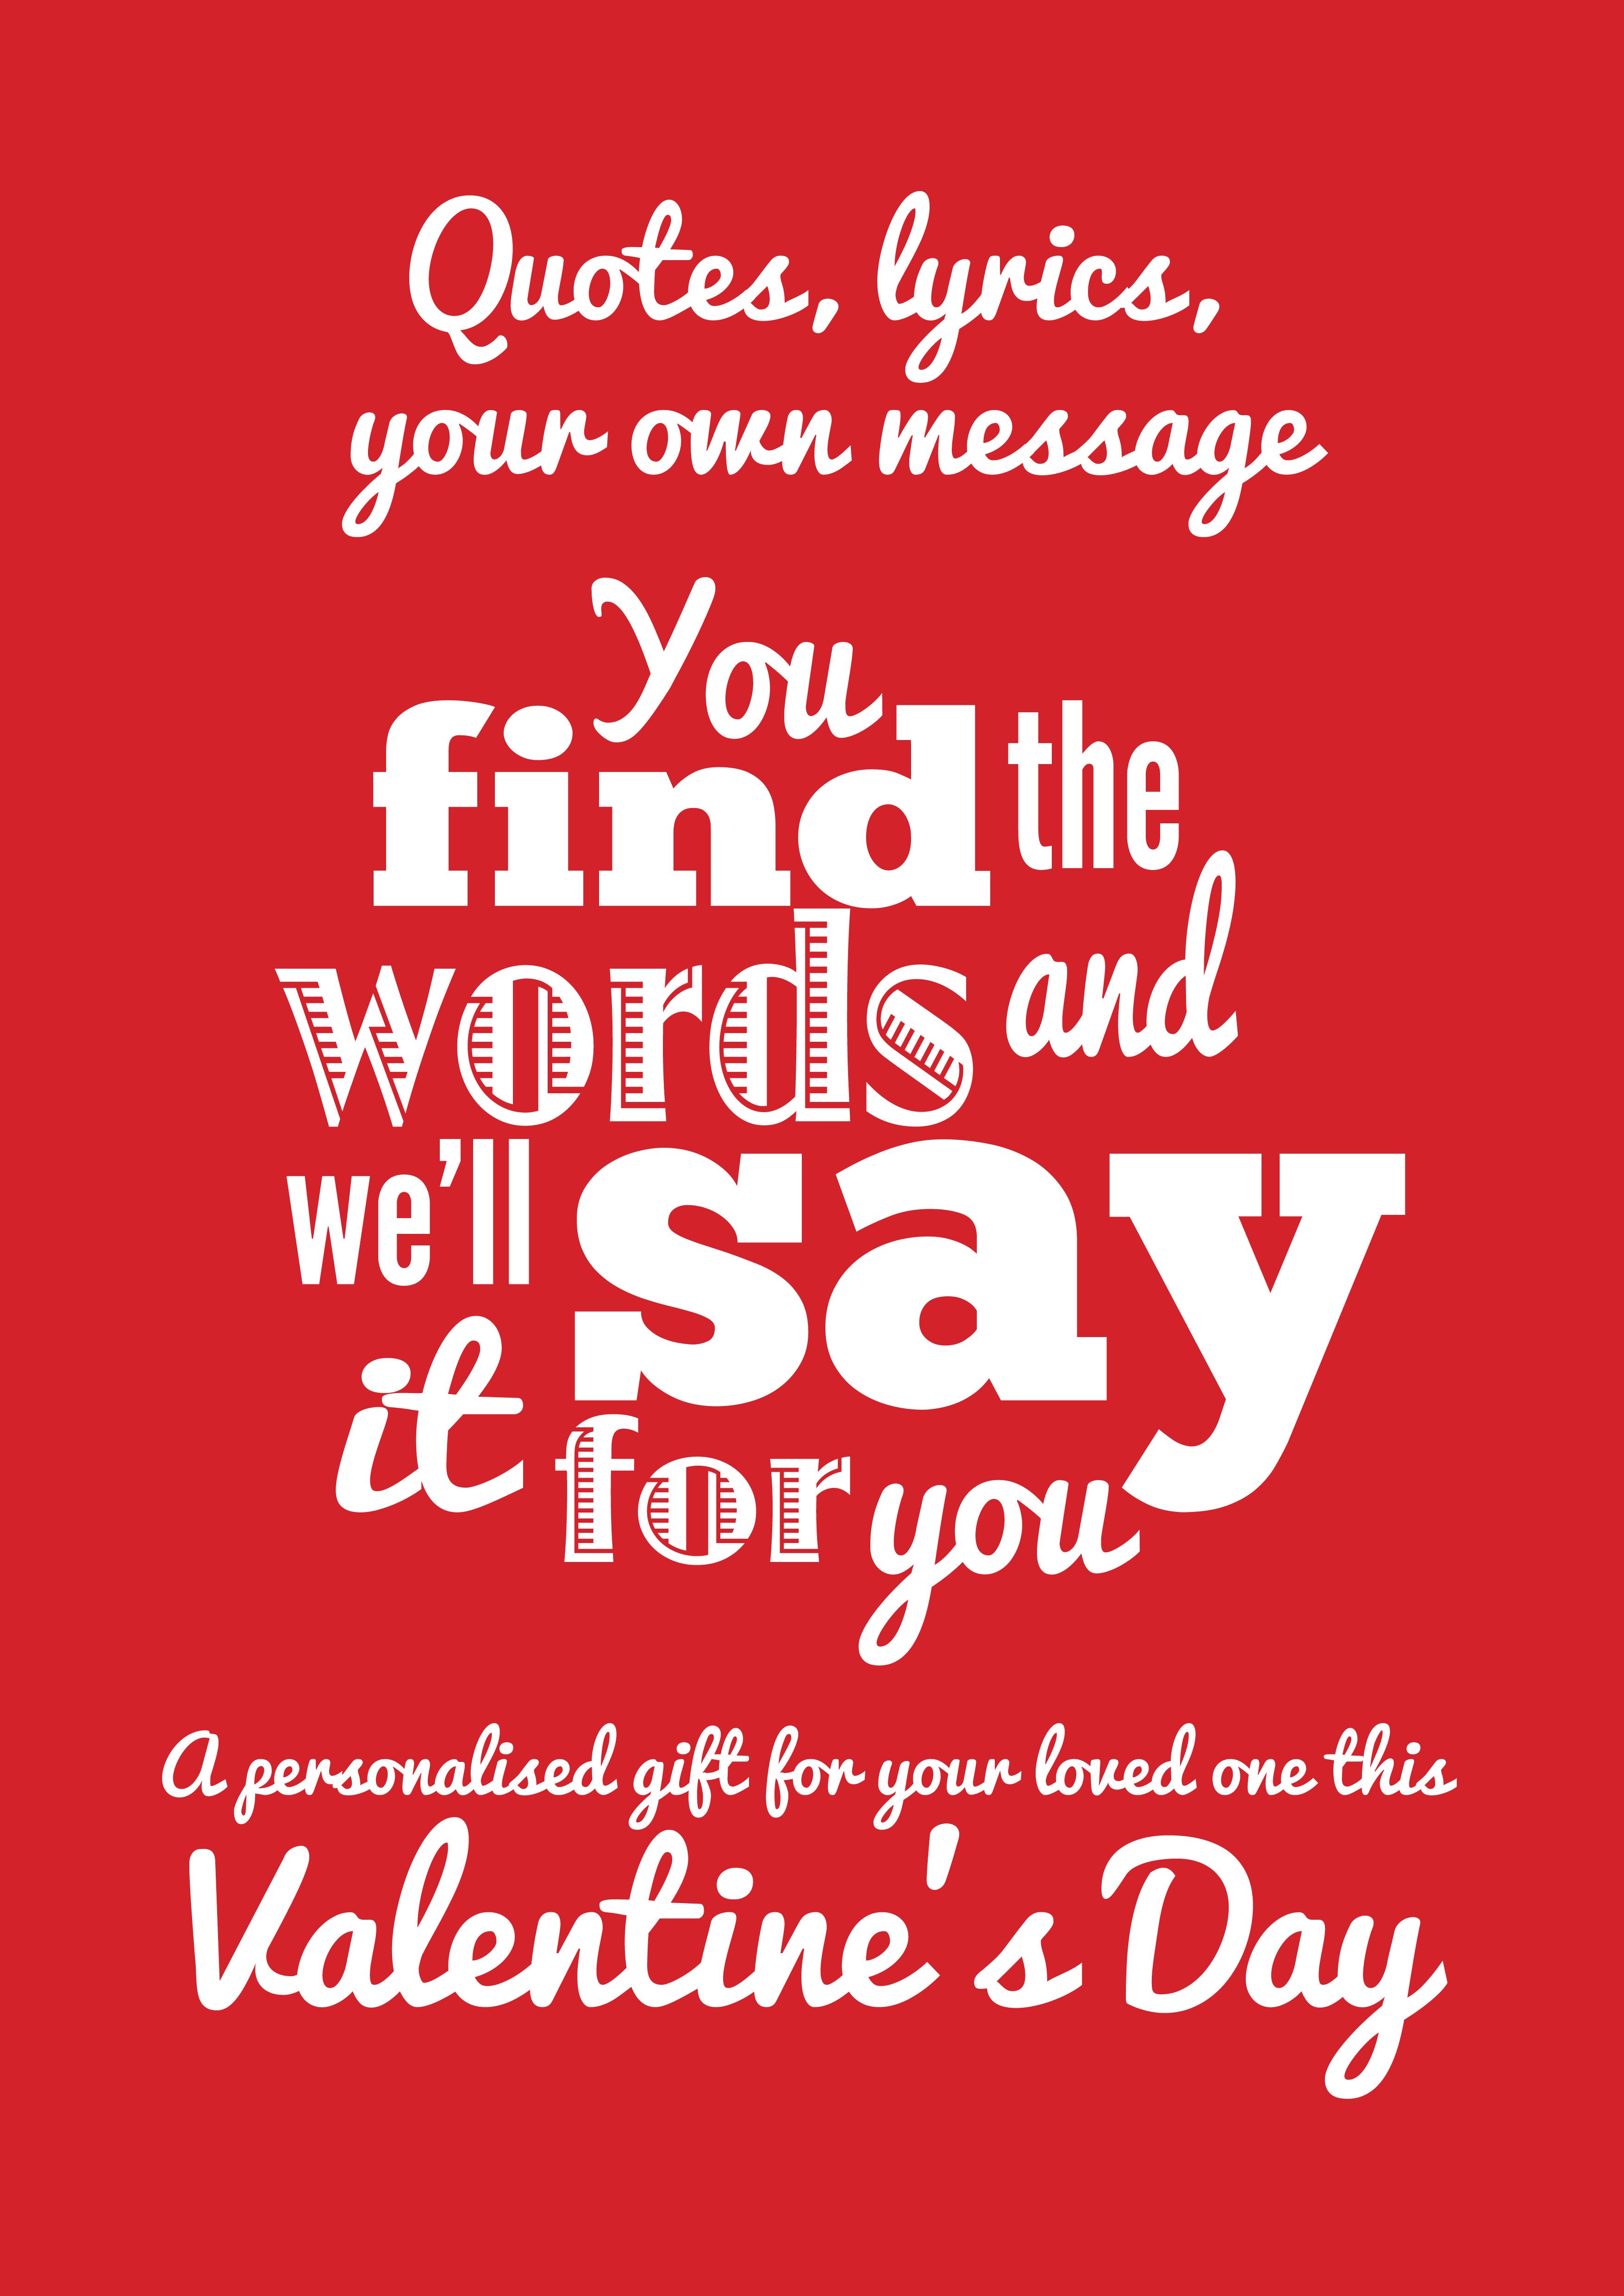 Valentine's Day quote #1